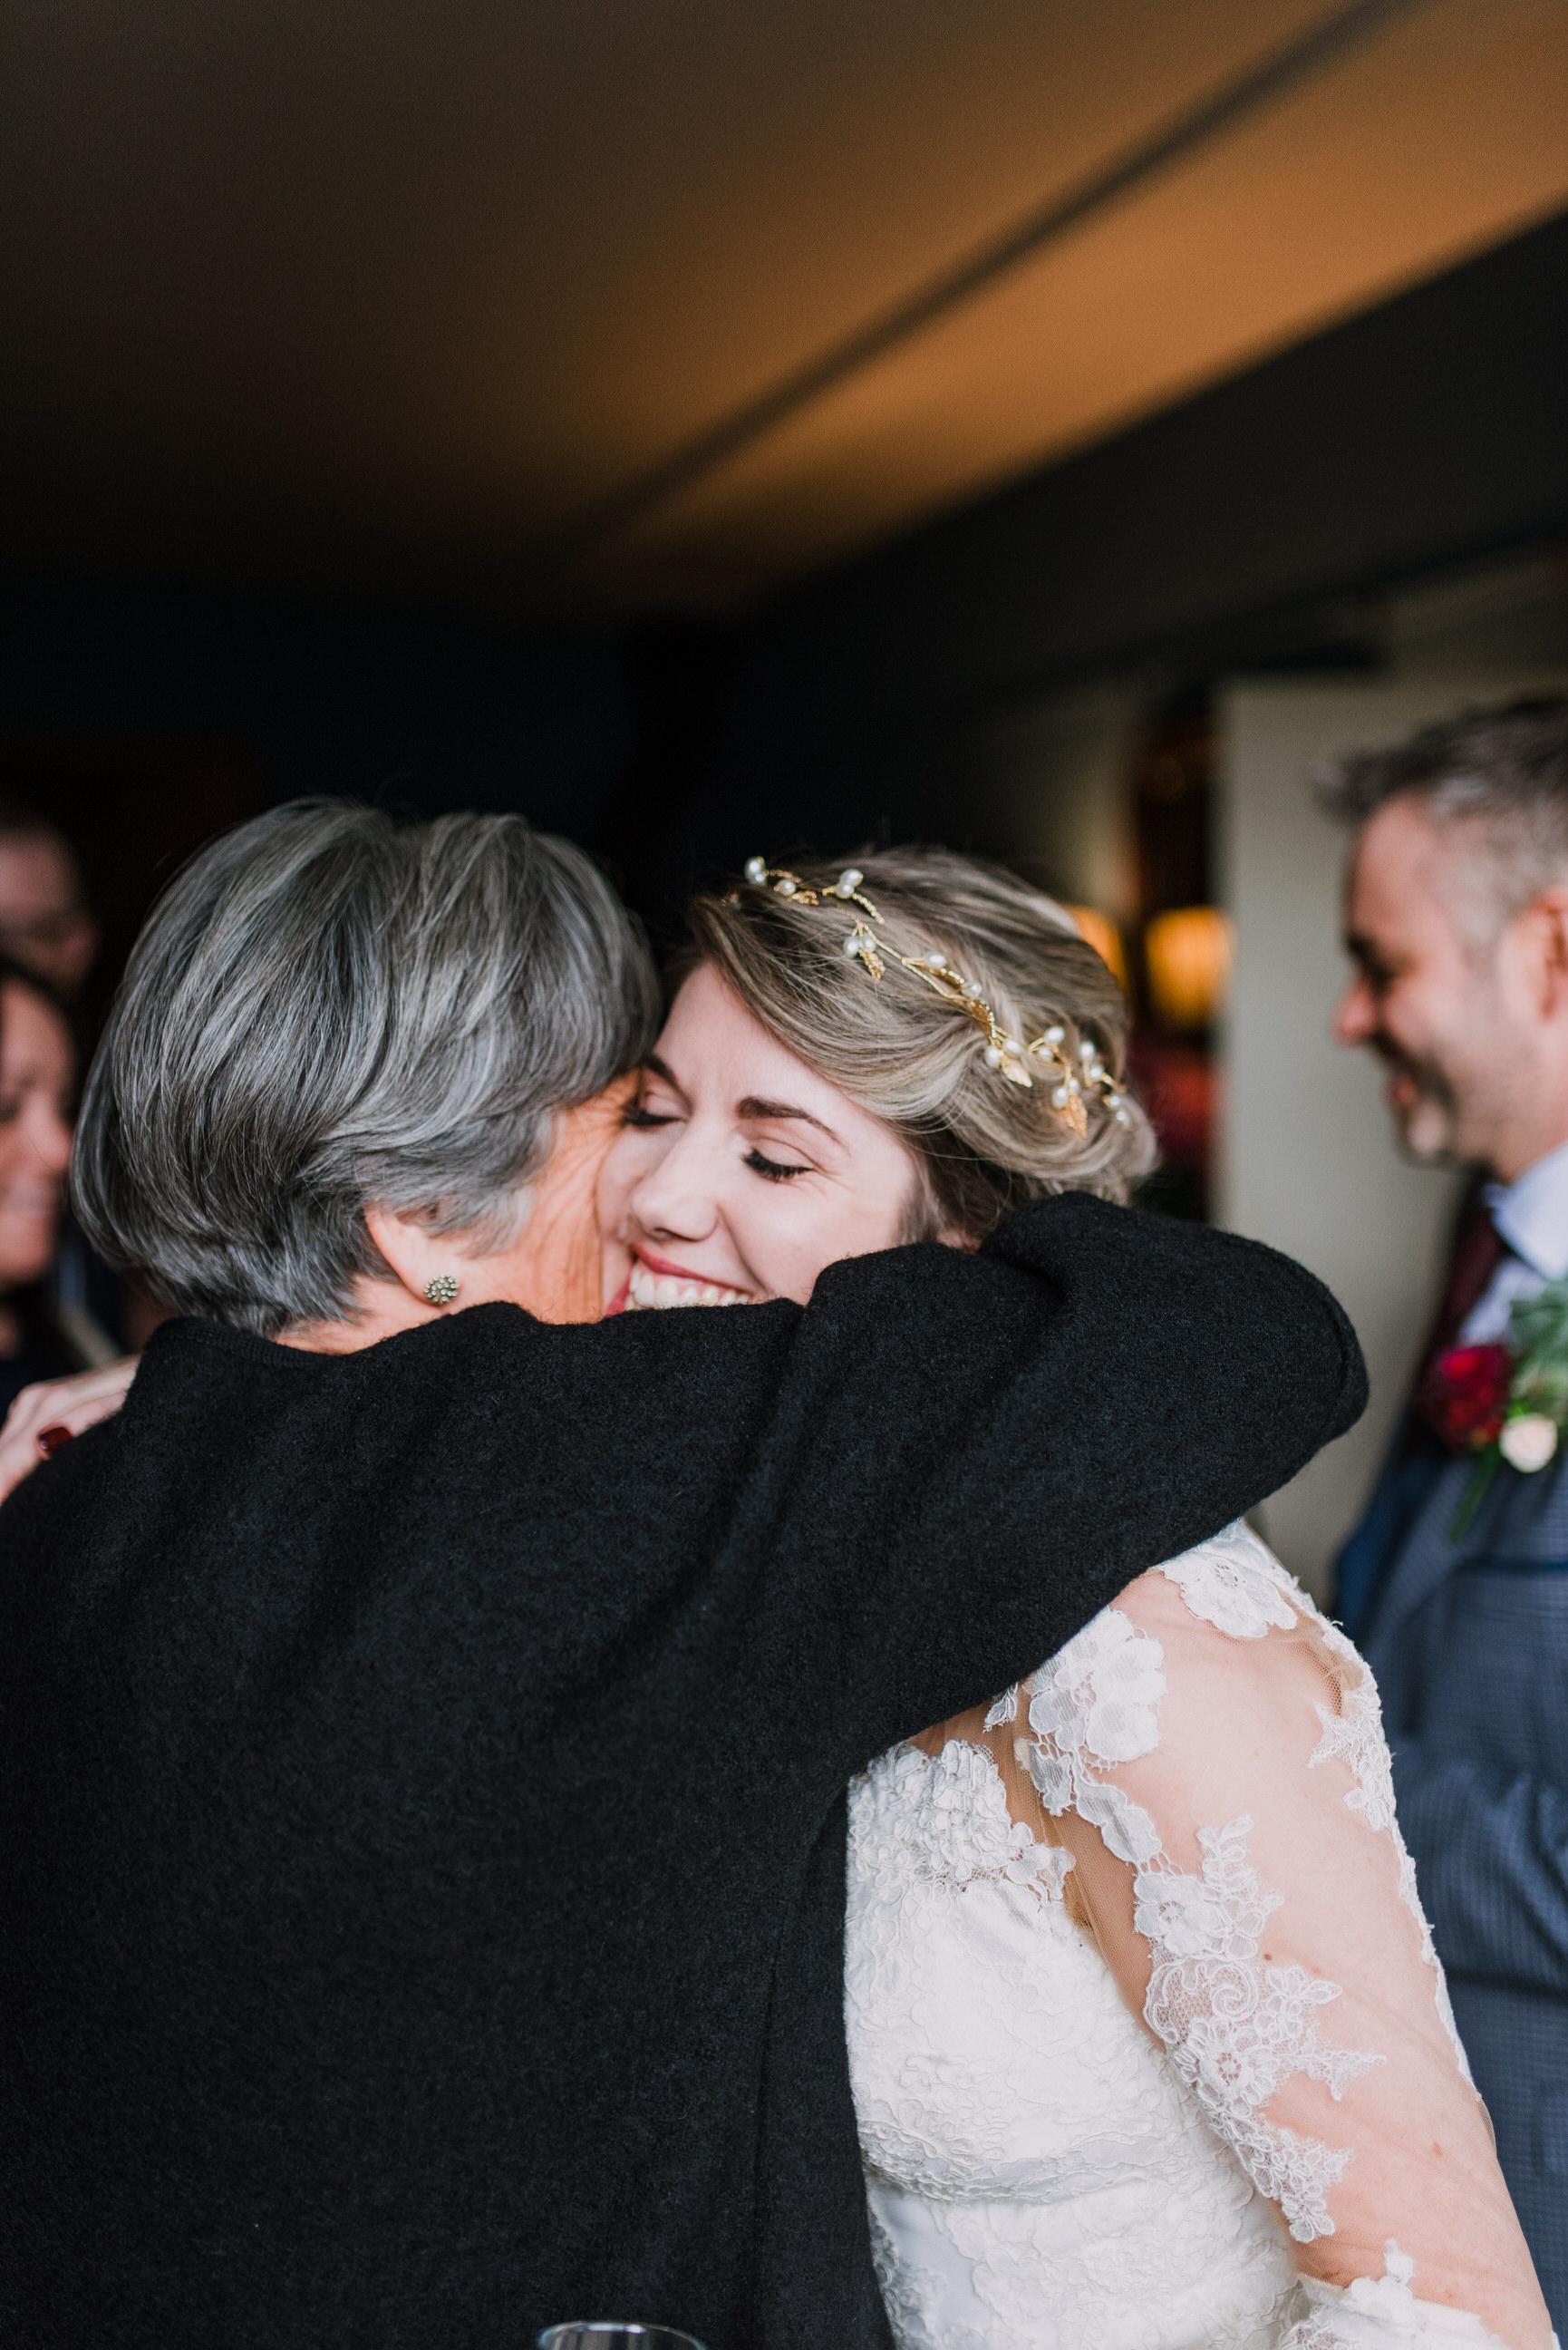 lissanoure castle wedding, northern ireland wedding photographer, romantic northern irish wedding venue, castle wedding ireland, natural wedding photography ni (69).jpg